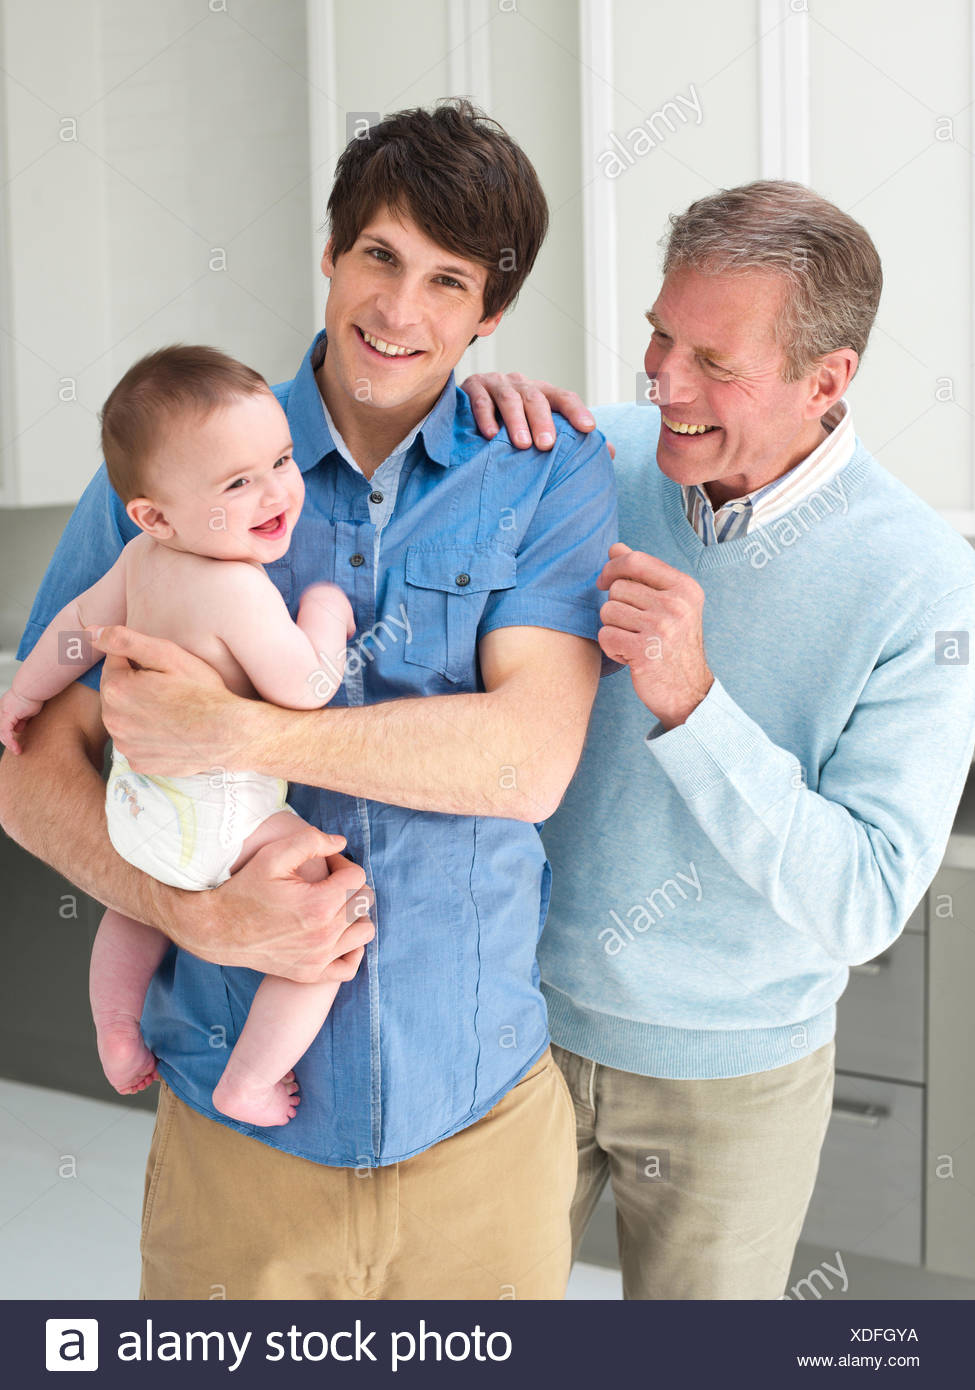 Smiling multi-generation males - Stock Image